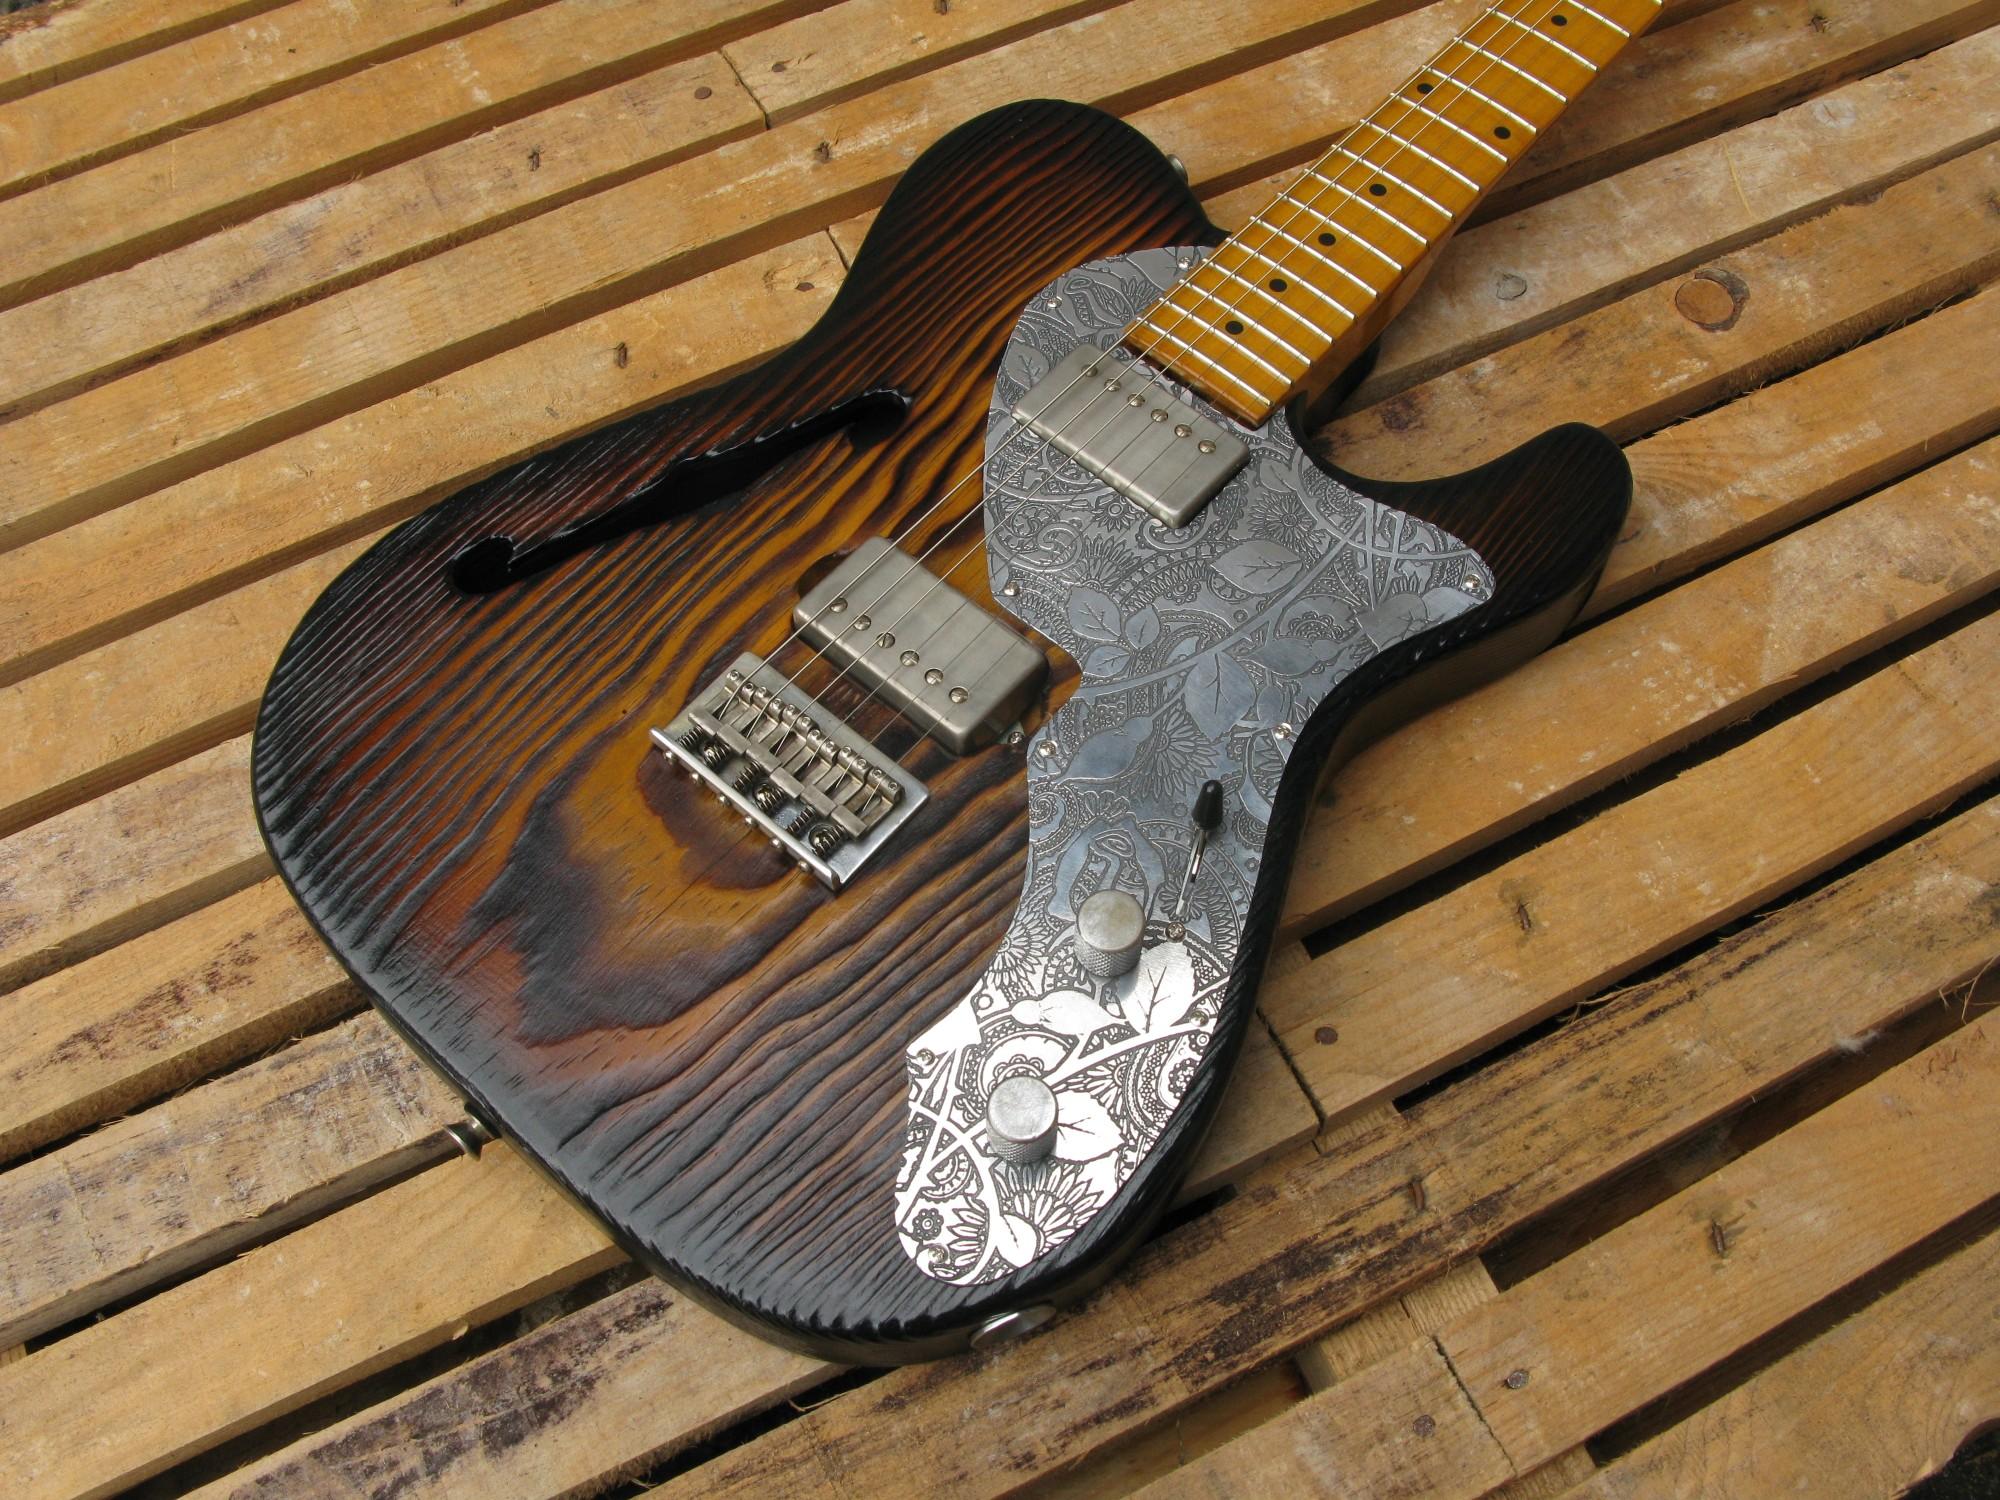 Body di una chitarra Telecaster Thinline in pino roasted con due PAF